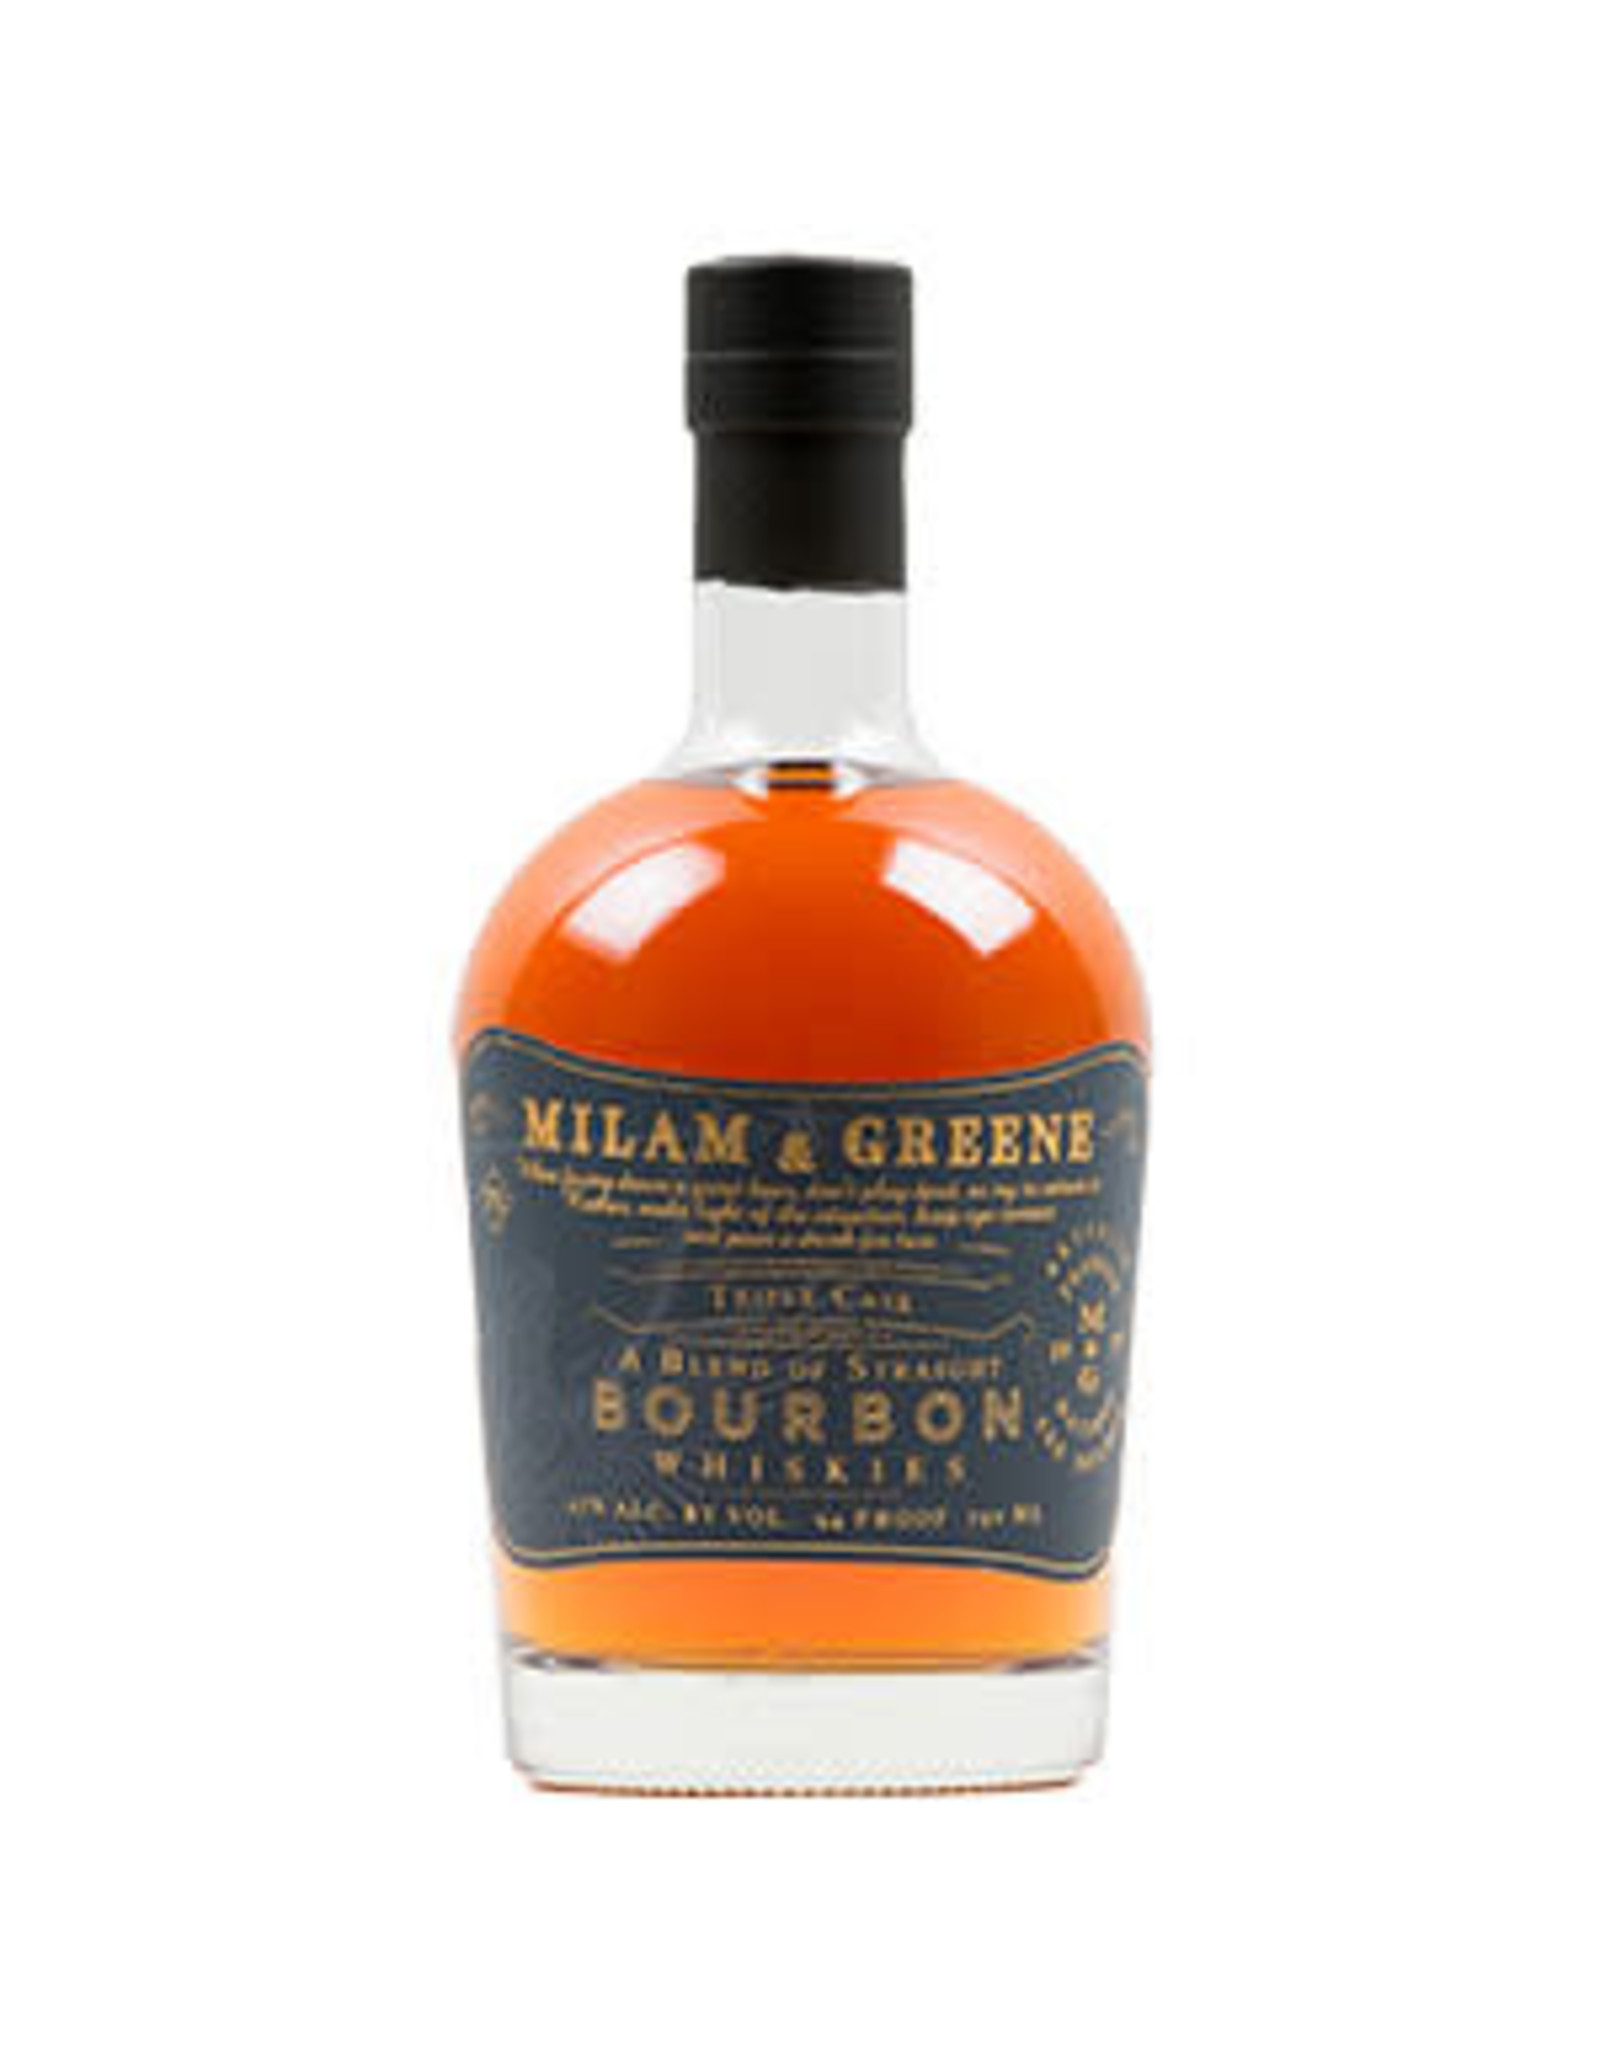 MILAM & GREEN TRIPLE CAST BOURBON